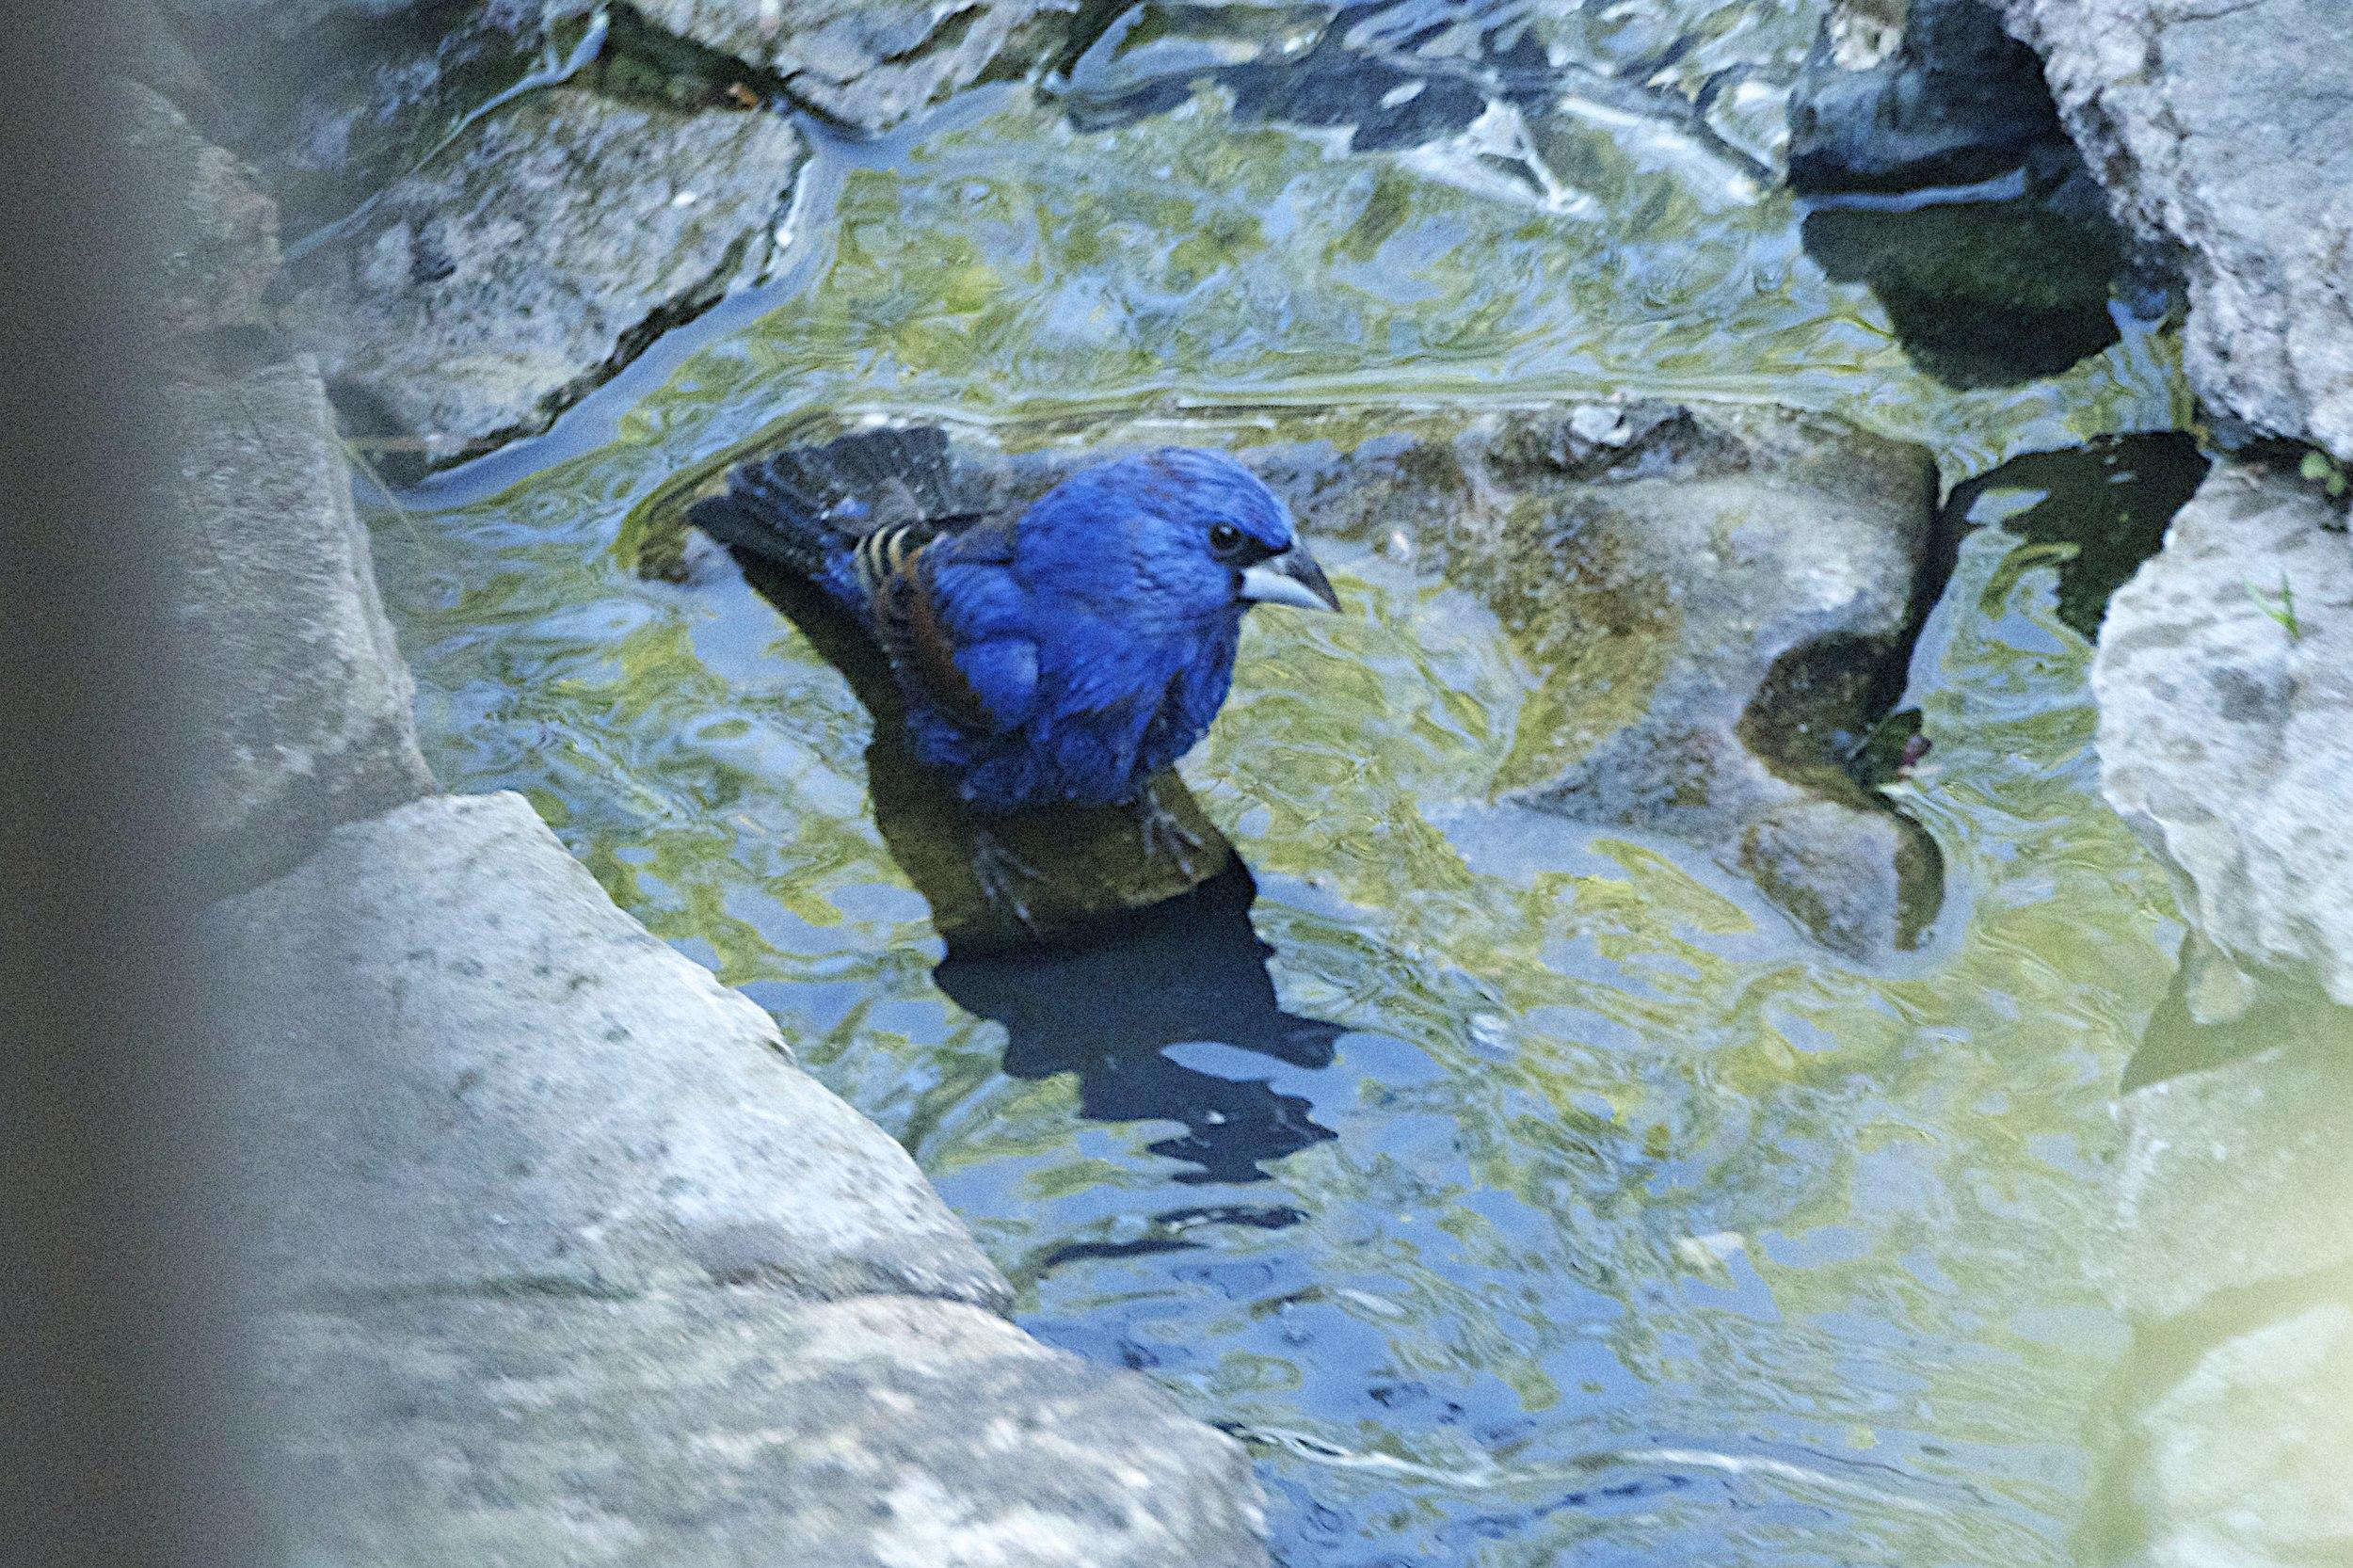 Blue Grosbeak-Male